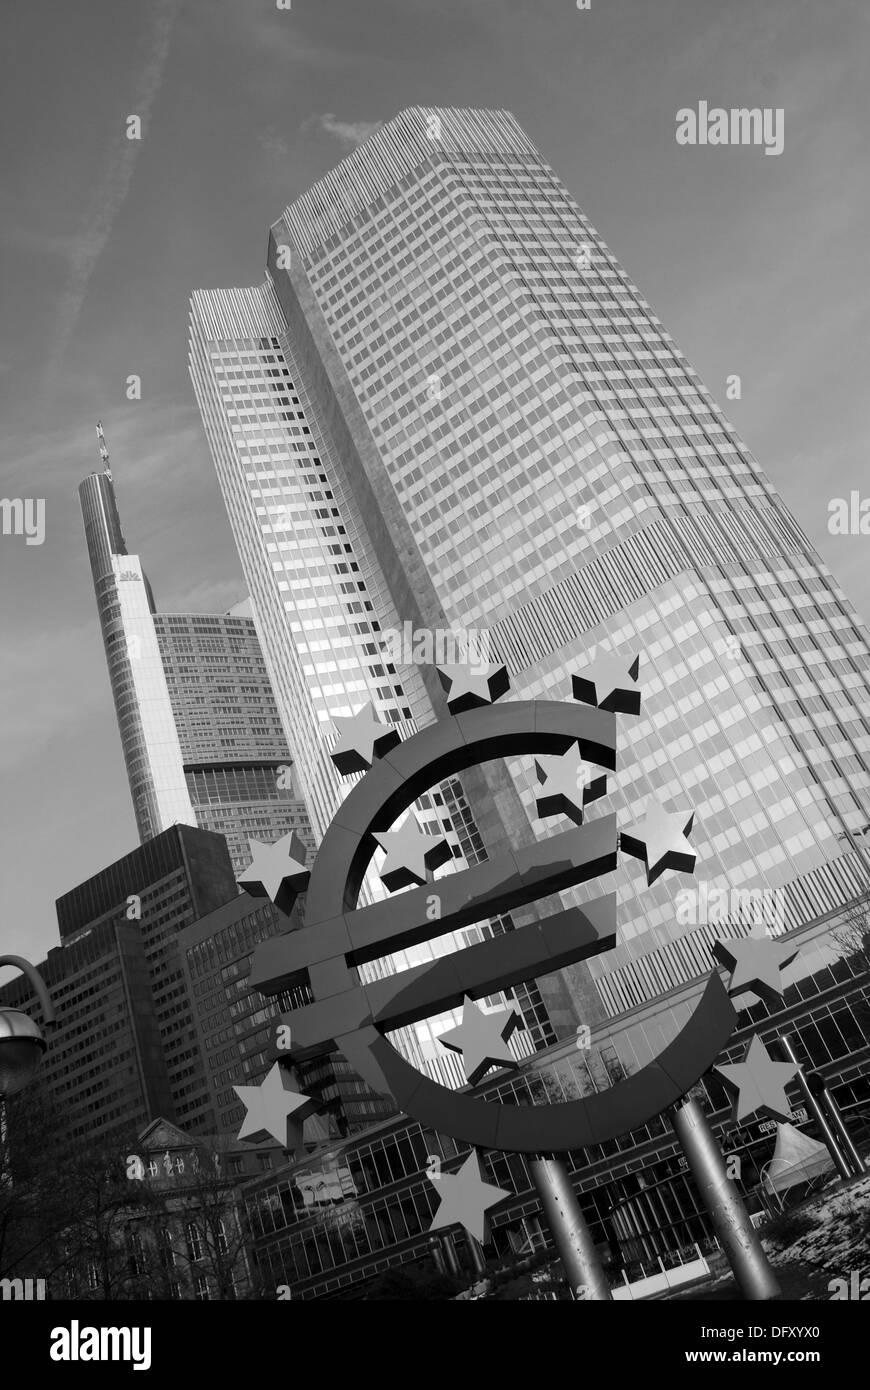 European Central Bank in Frankfurt - Stock Image